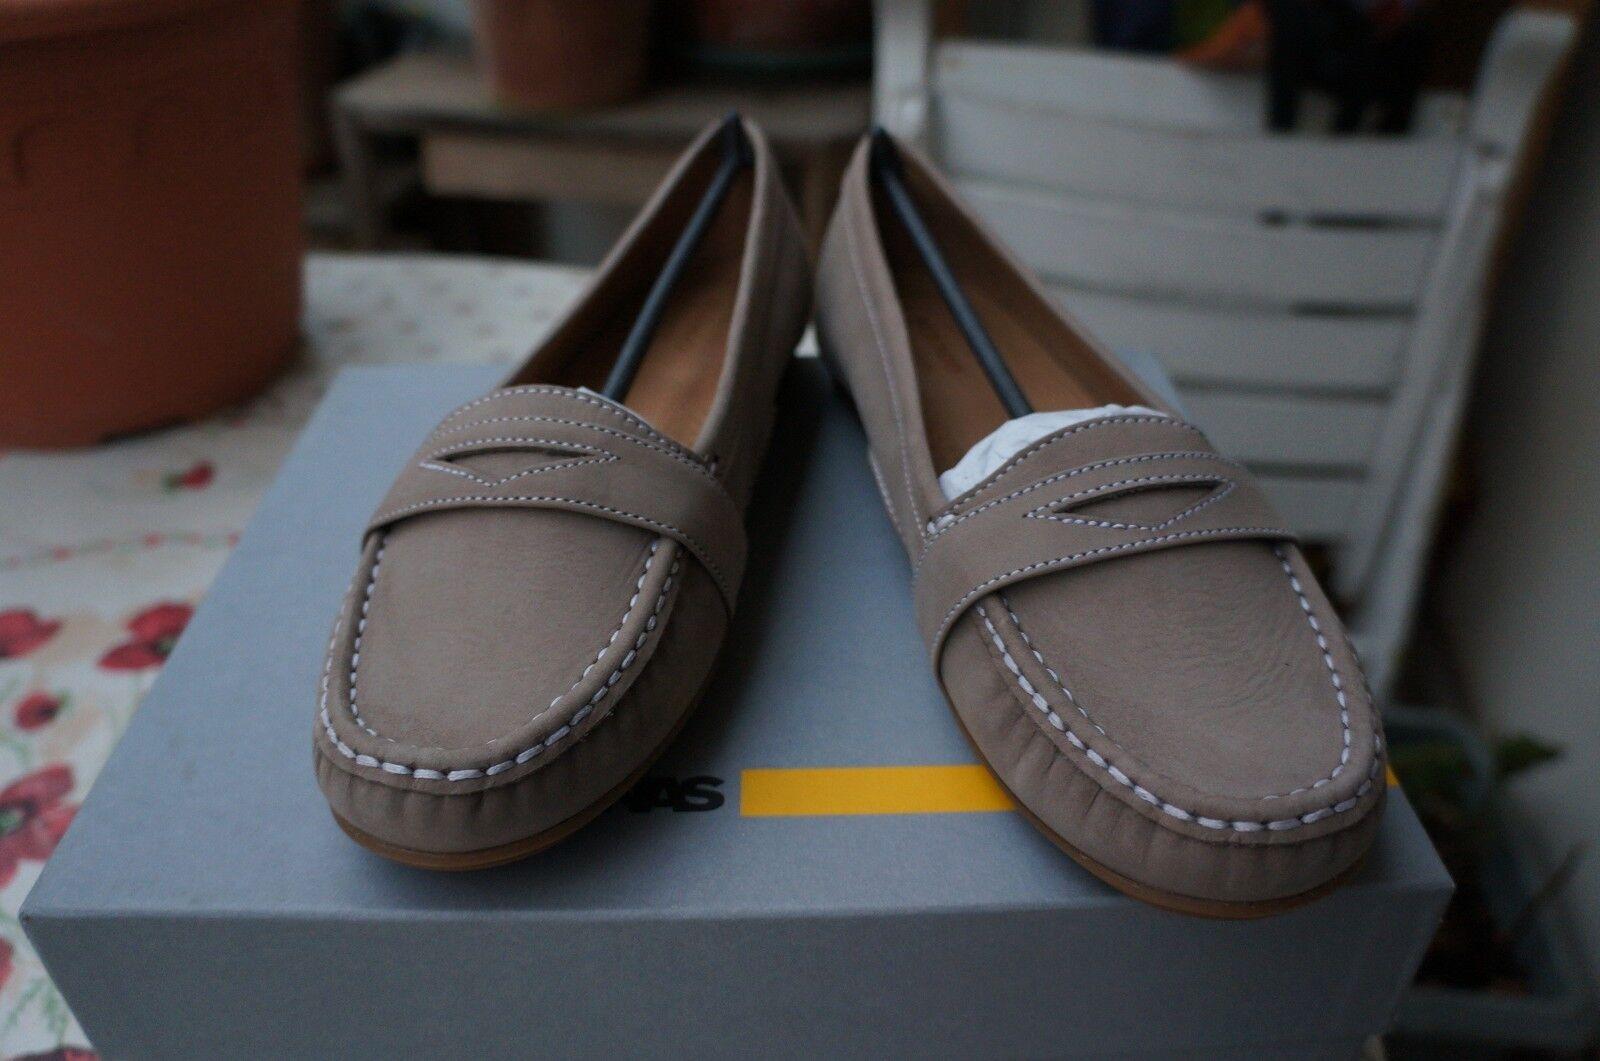 Sebago meriden penny, boat, ballerinas, beige 40.5 EU, uk 7, 26.5 cm